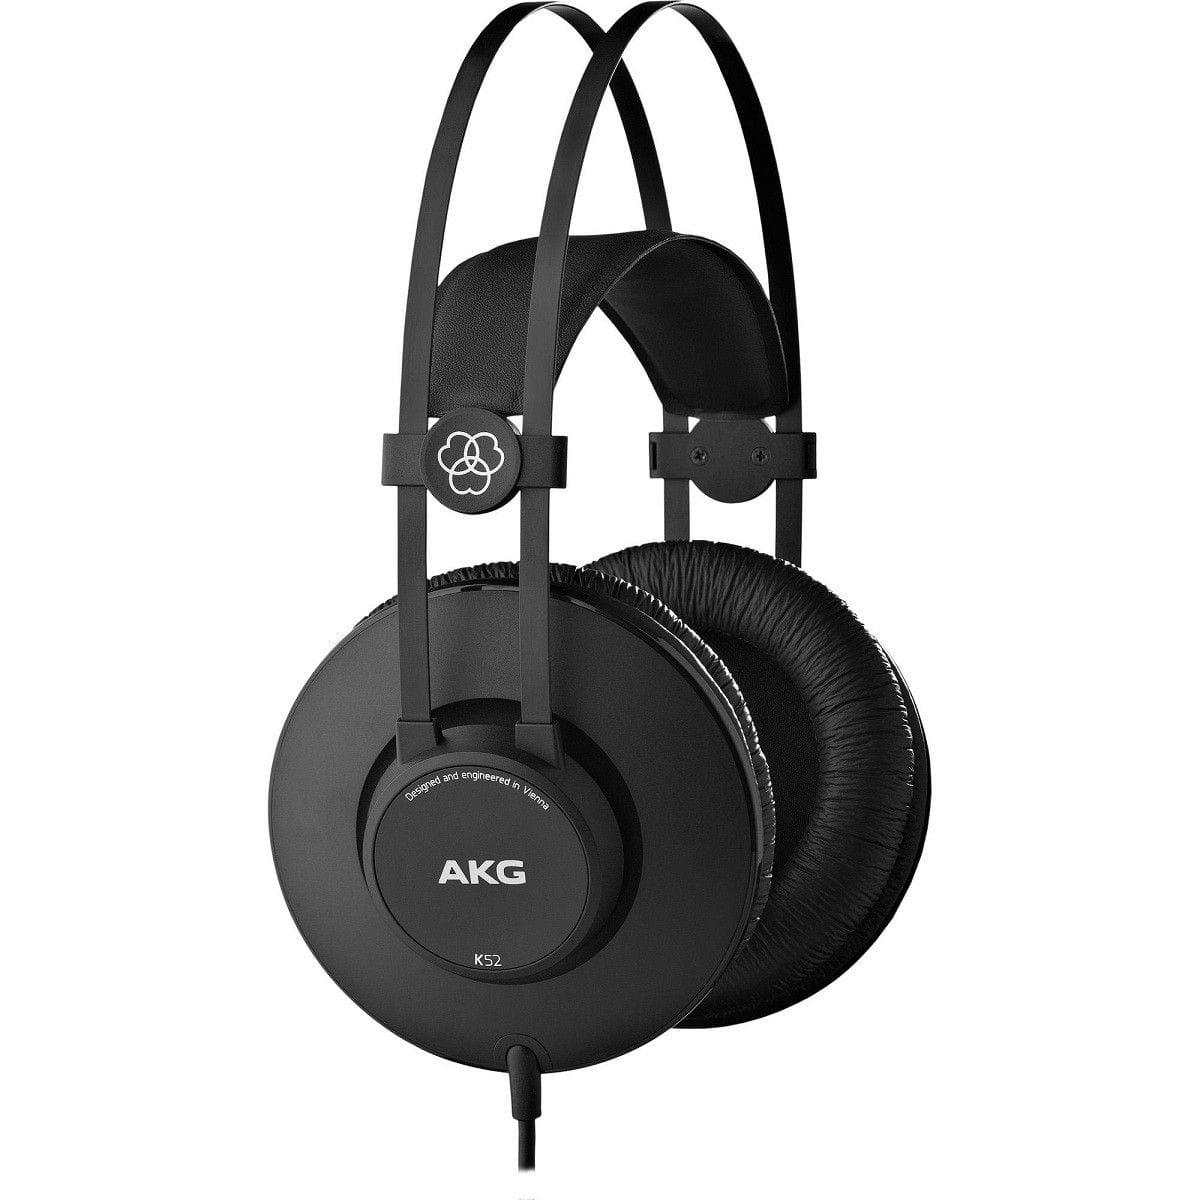 AKG Fone de Ouvido Profissional K52